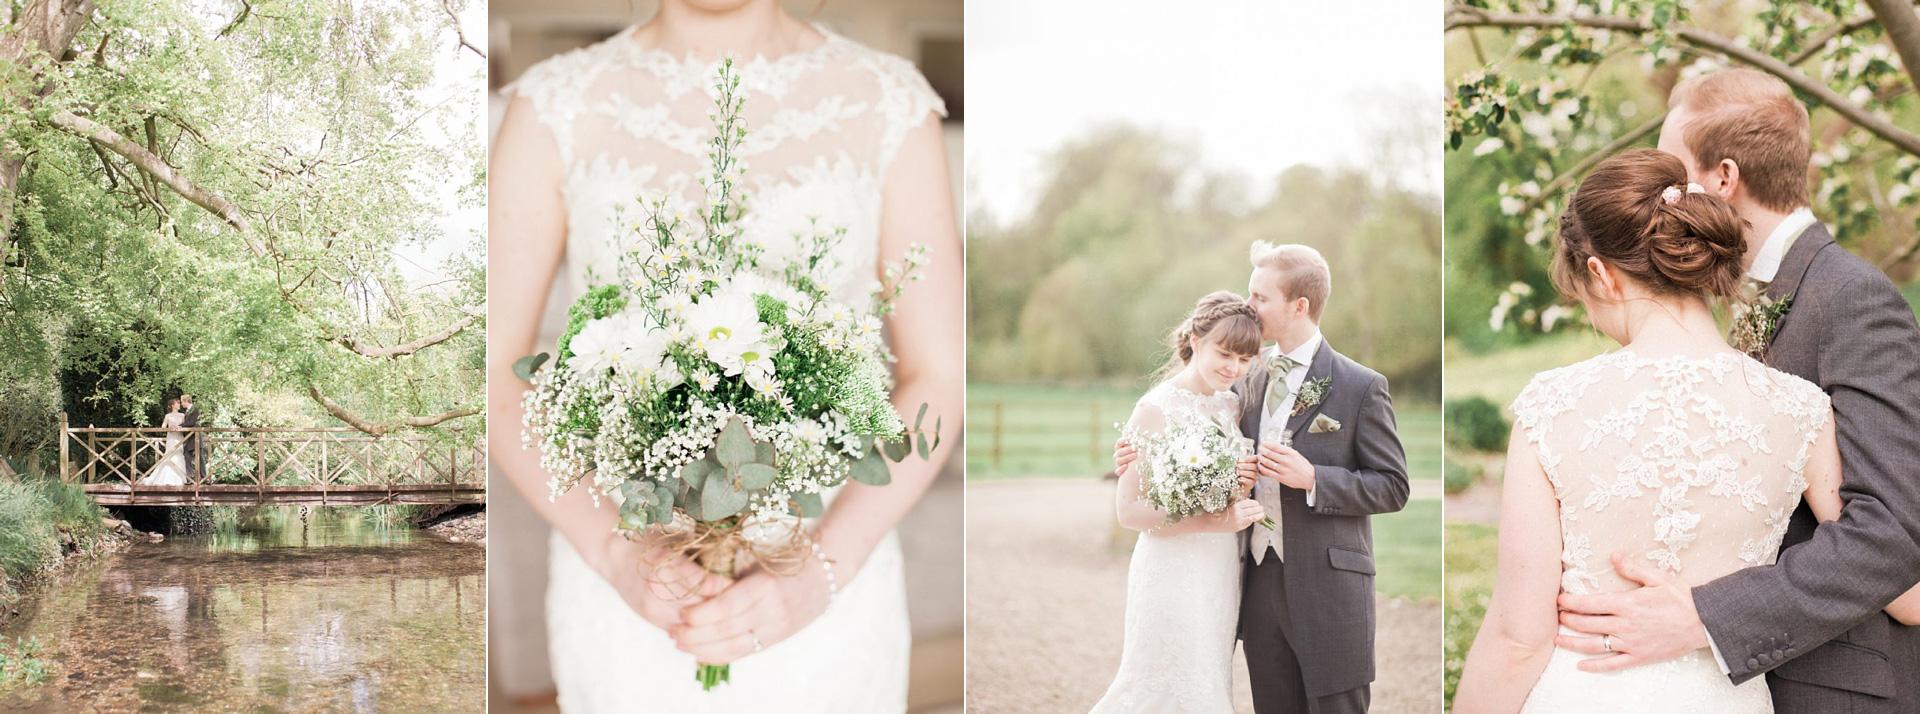 Luxury-Wedding-Photography-by-Fine-Art-Wedding-Photography-Lilybean-Photography-04